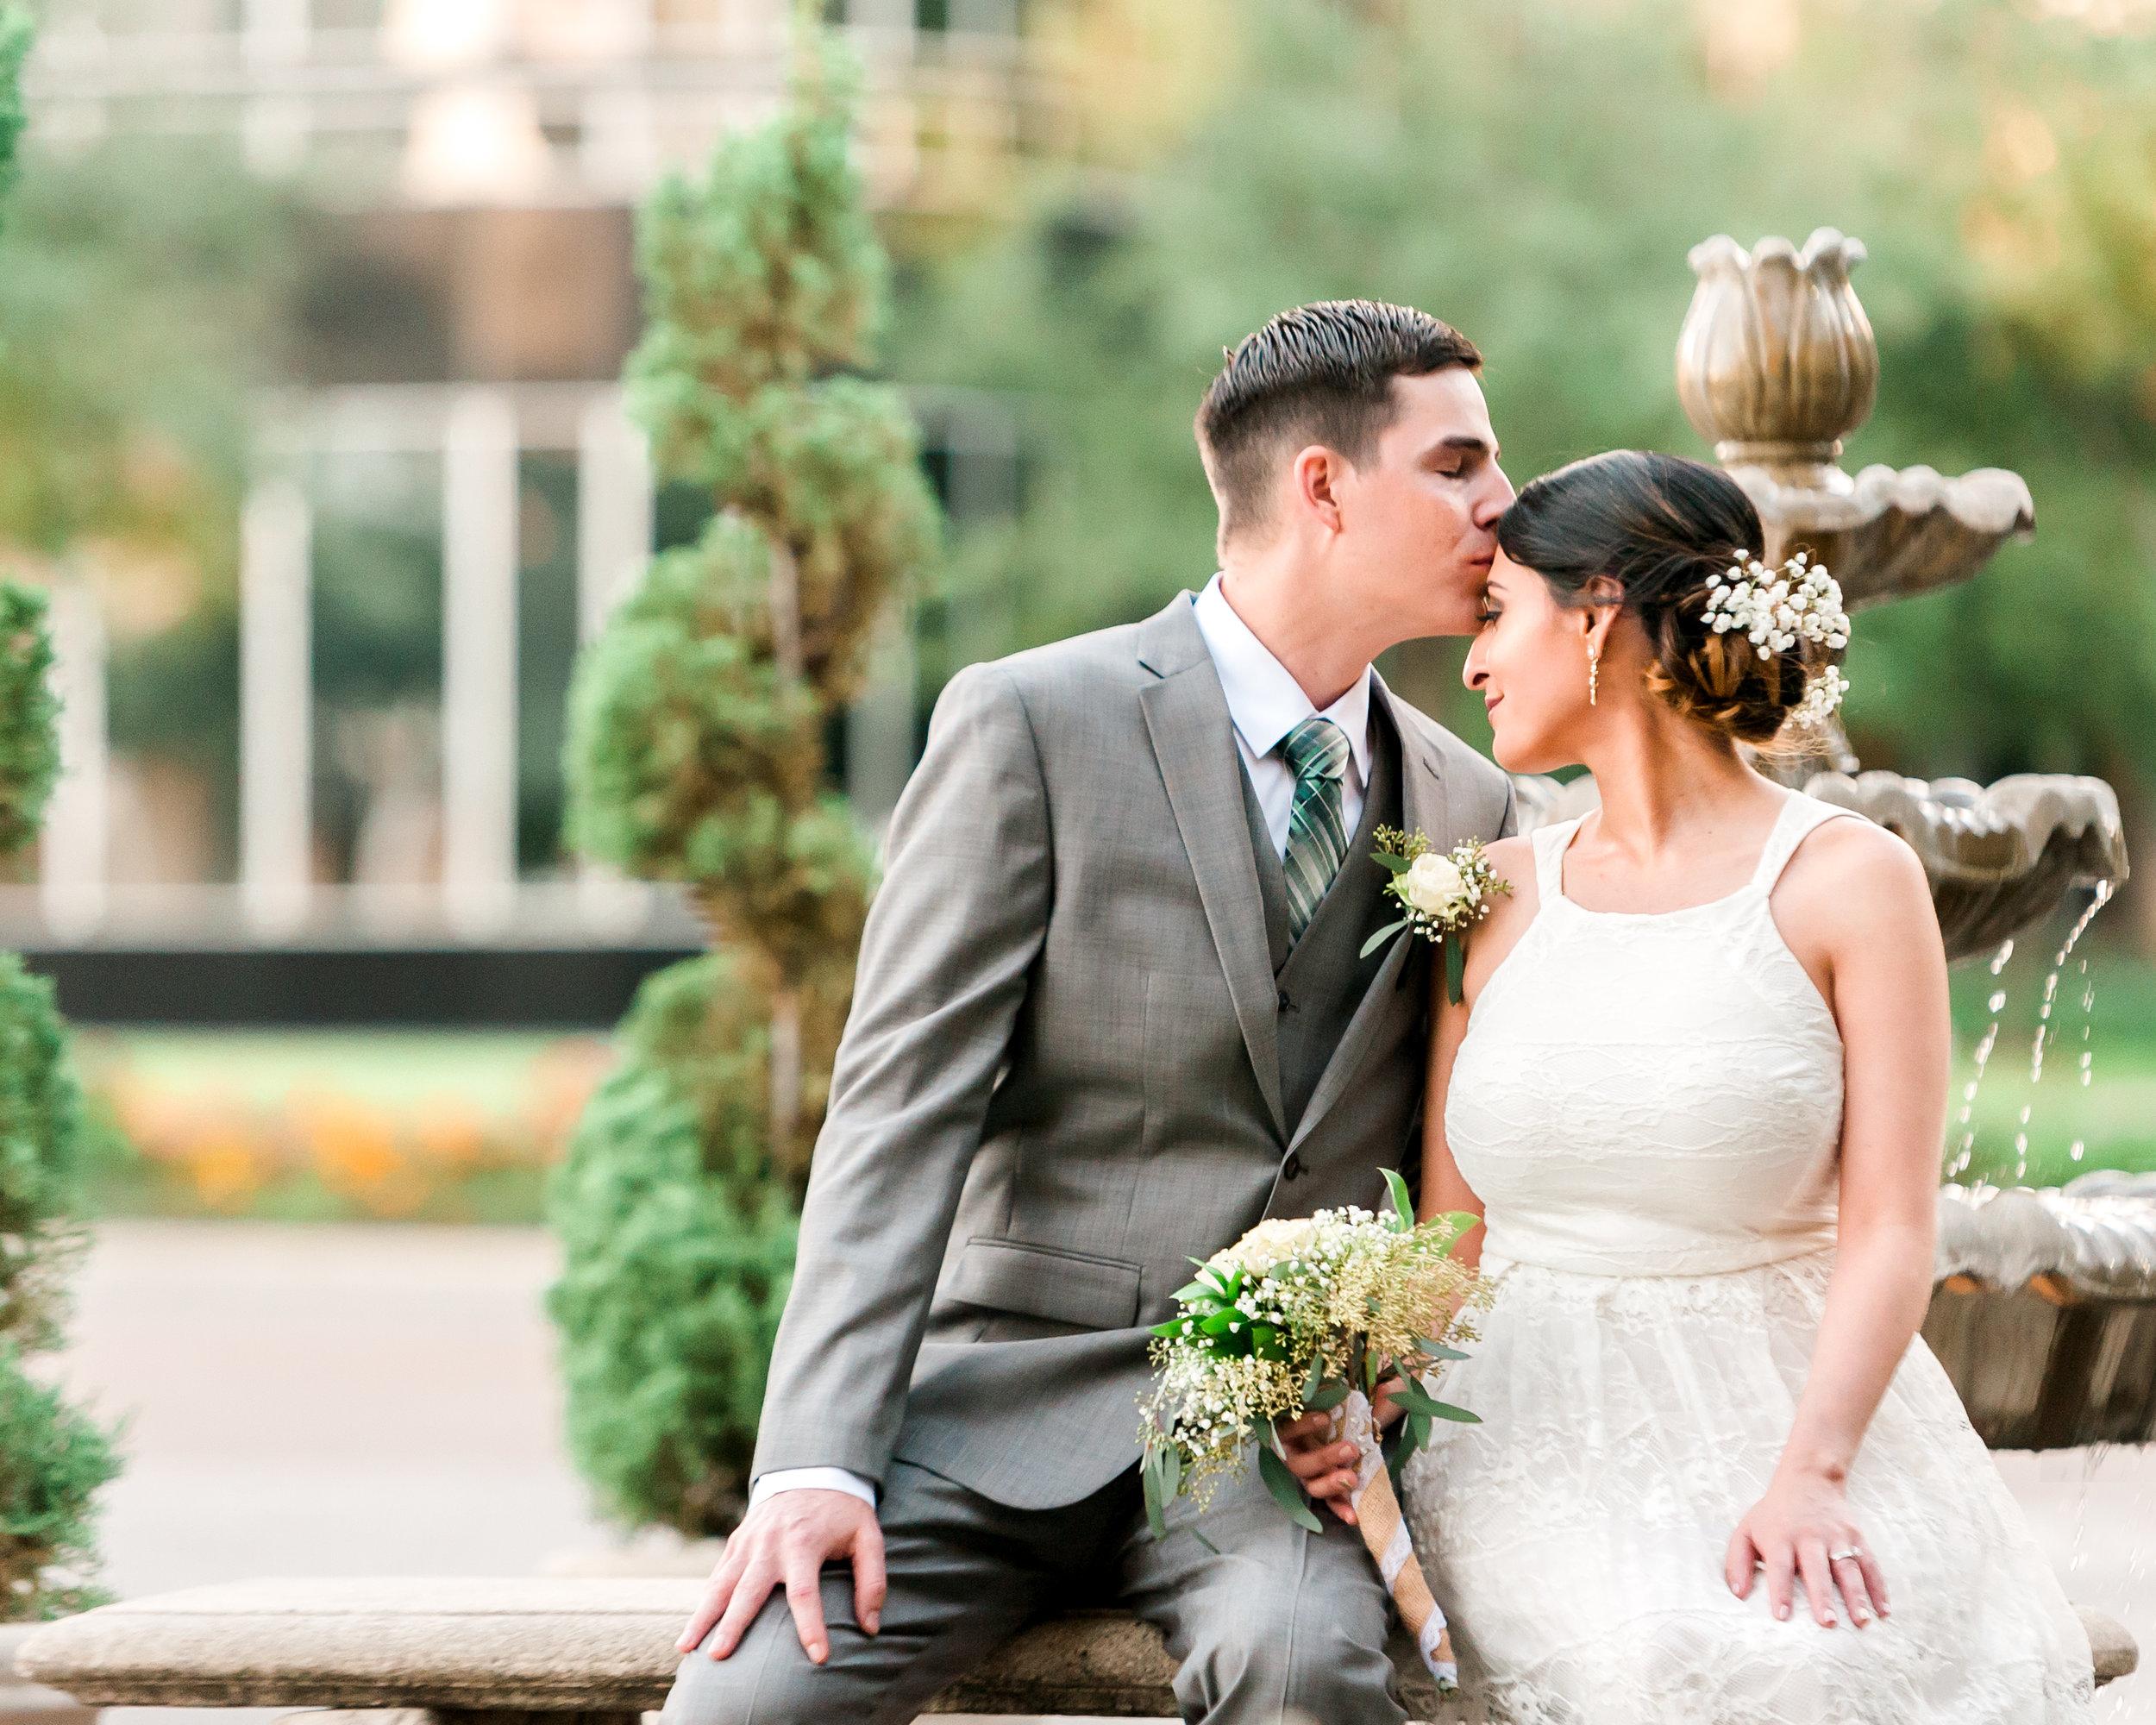 katy-wedding-photographer-houston-wedding-photographer-bride-sugar-land-cypress-richmond-spring-20.jpg